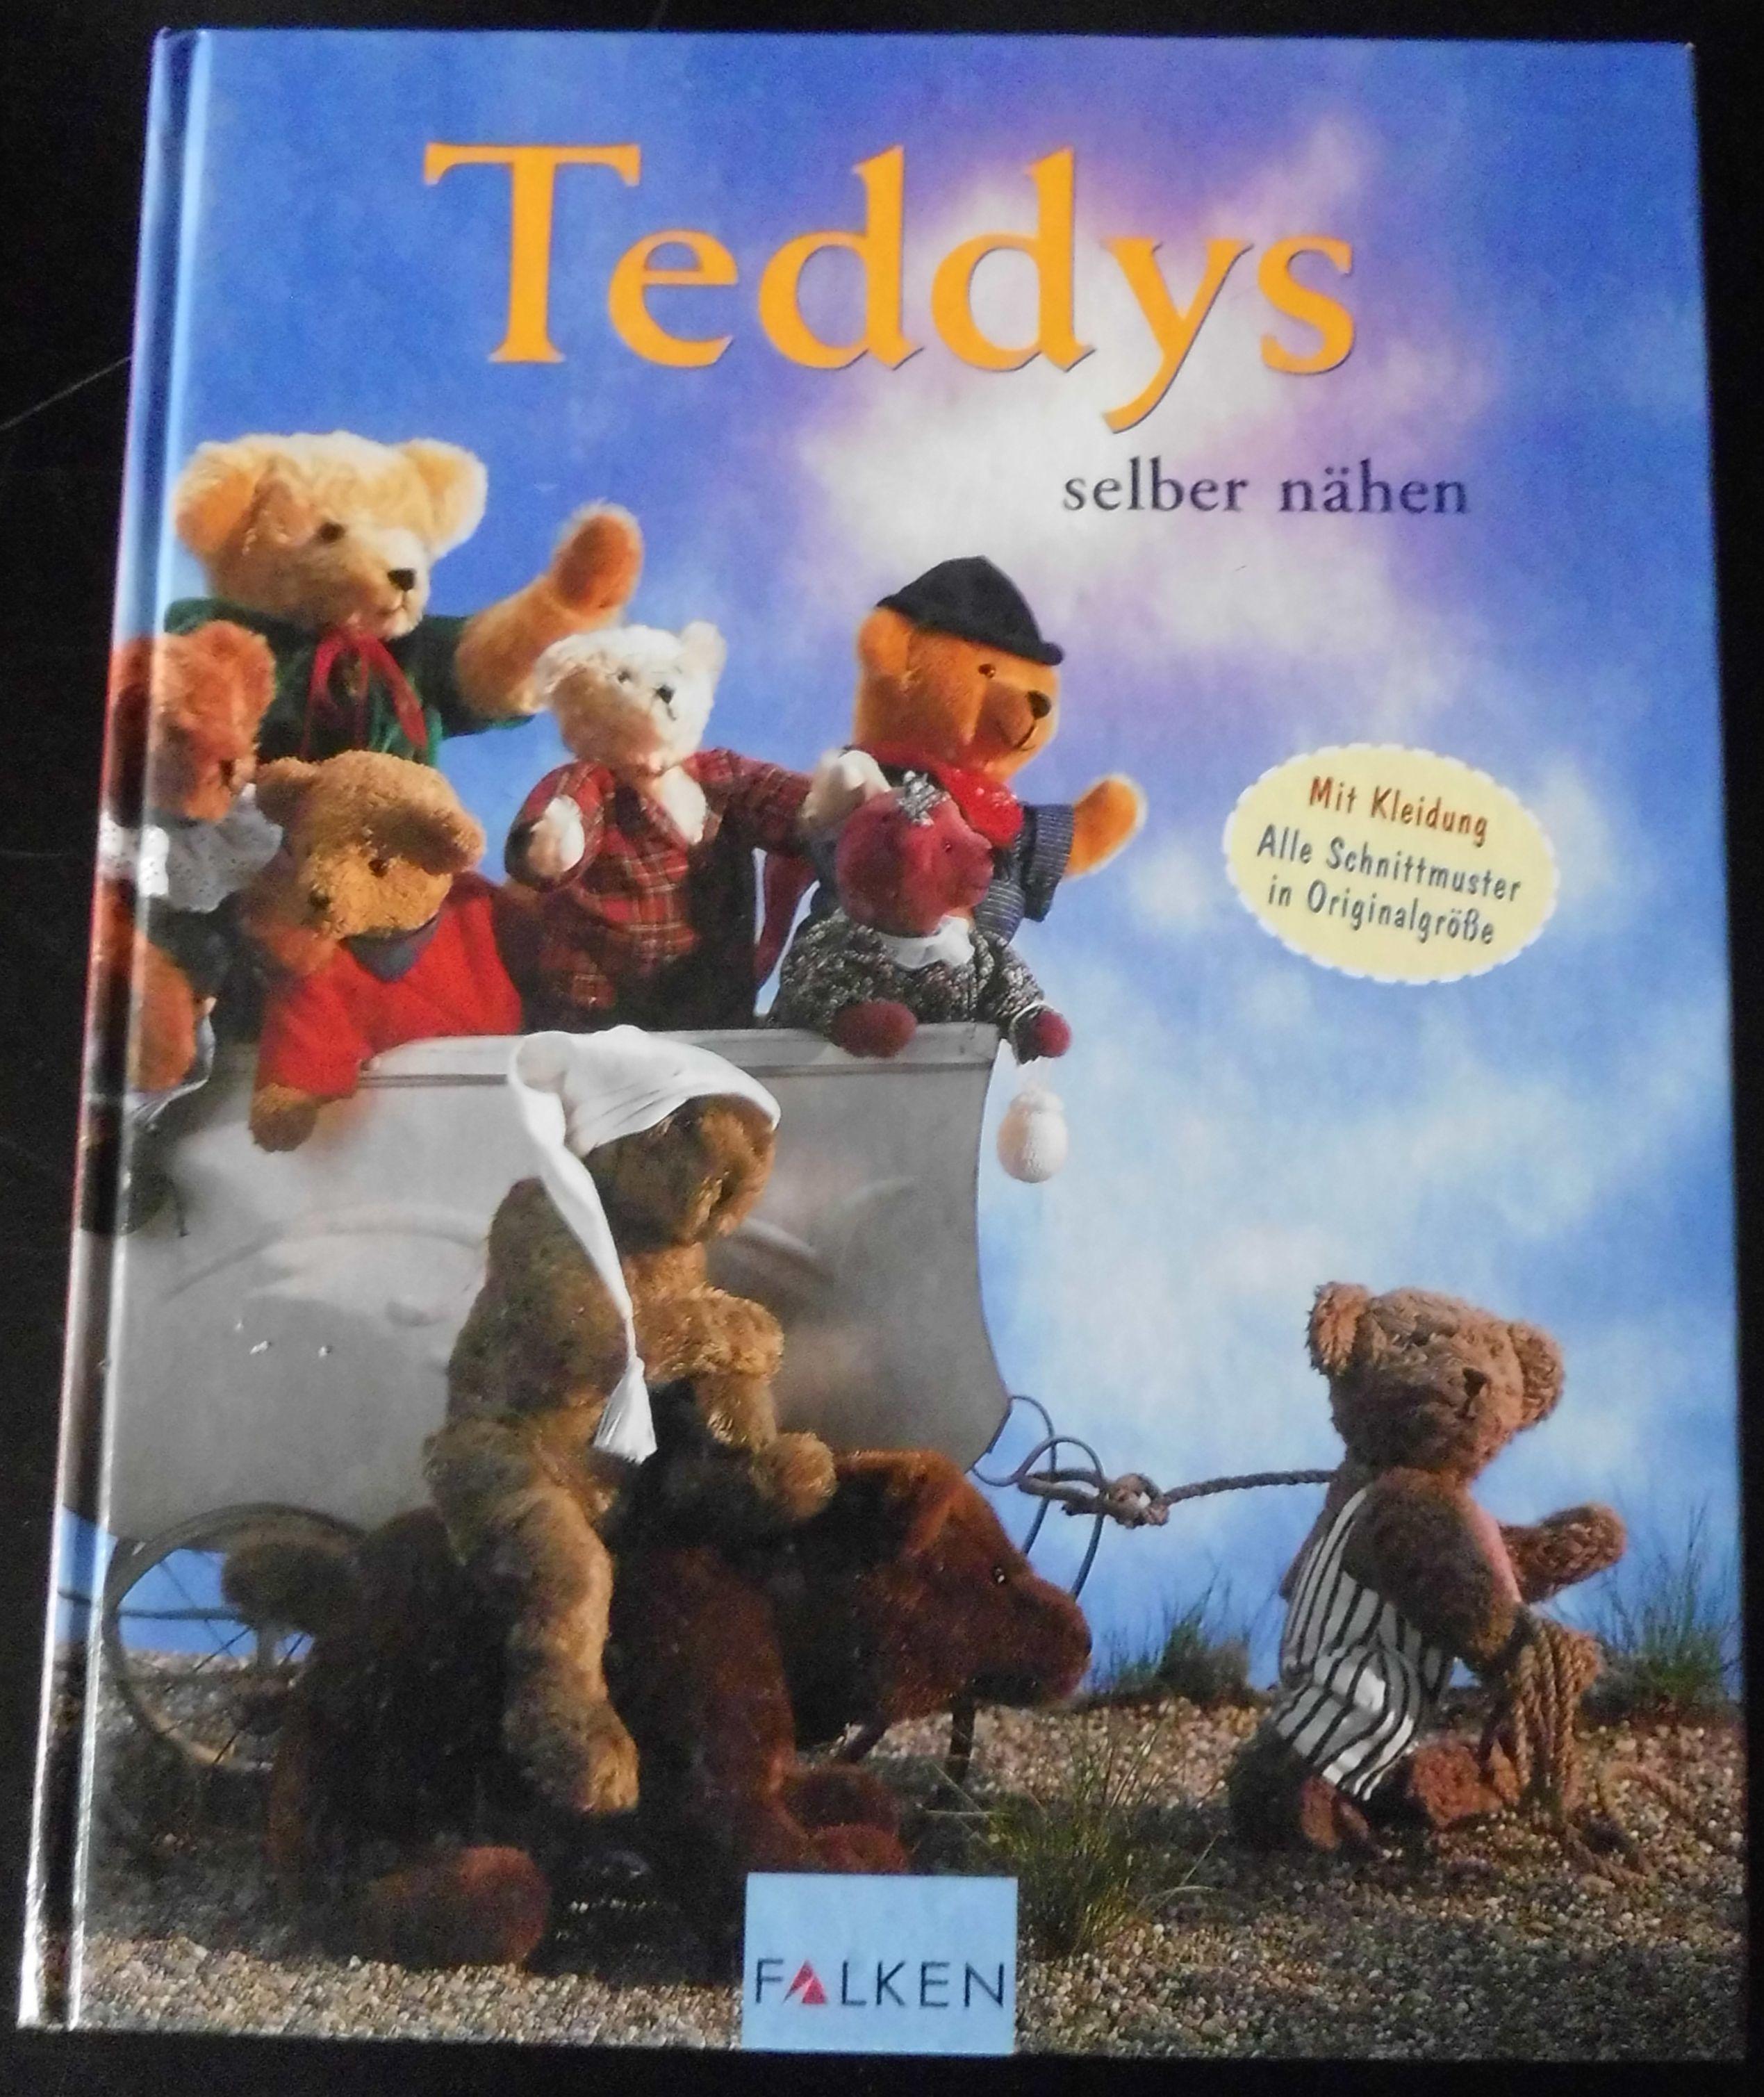 Teddys selber nähen